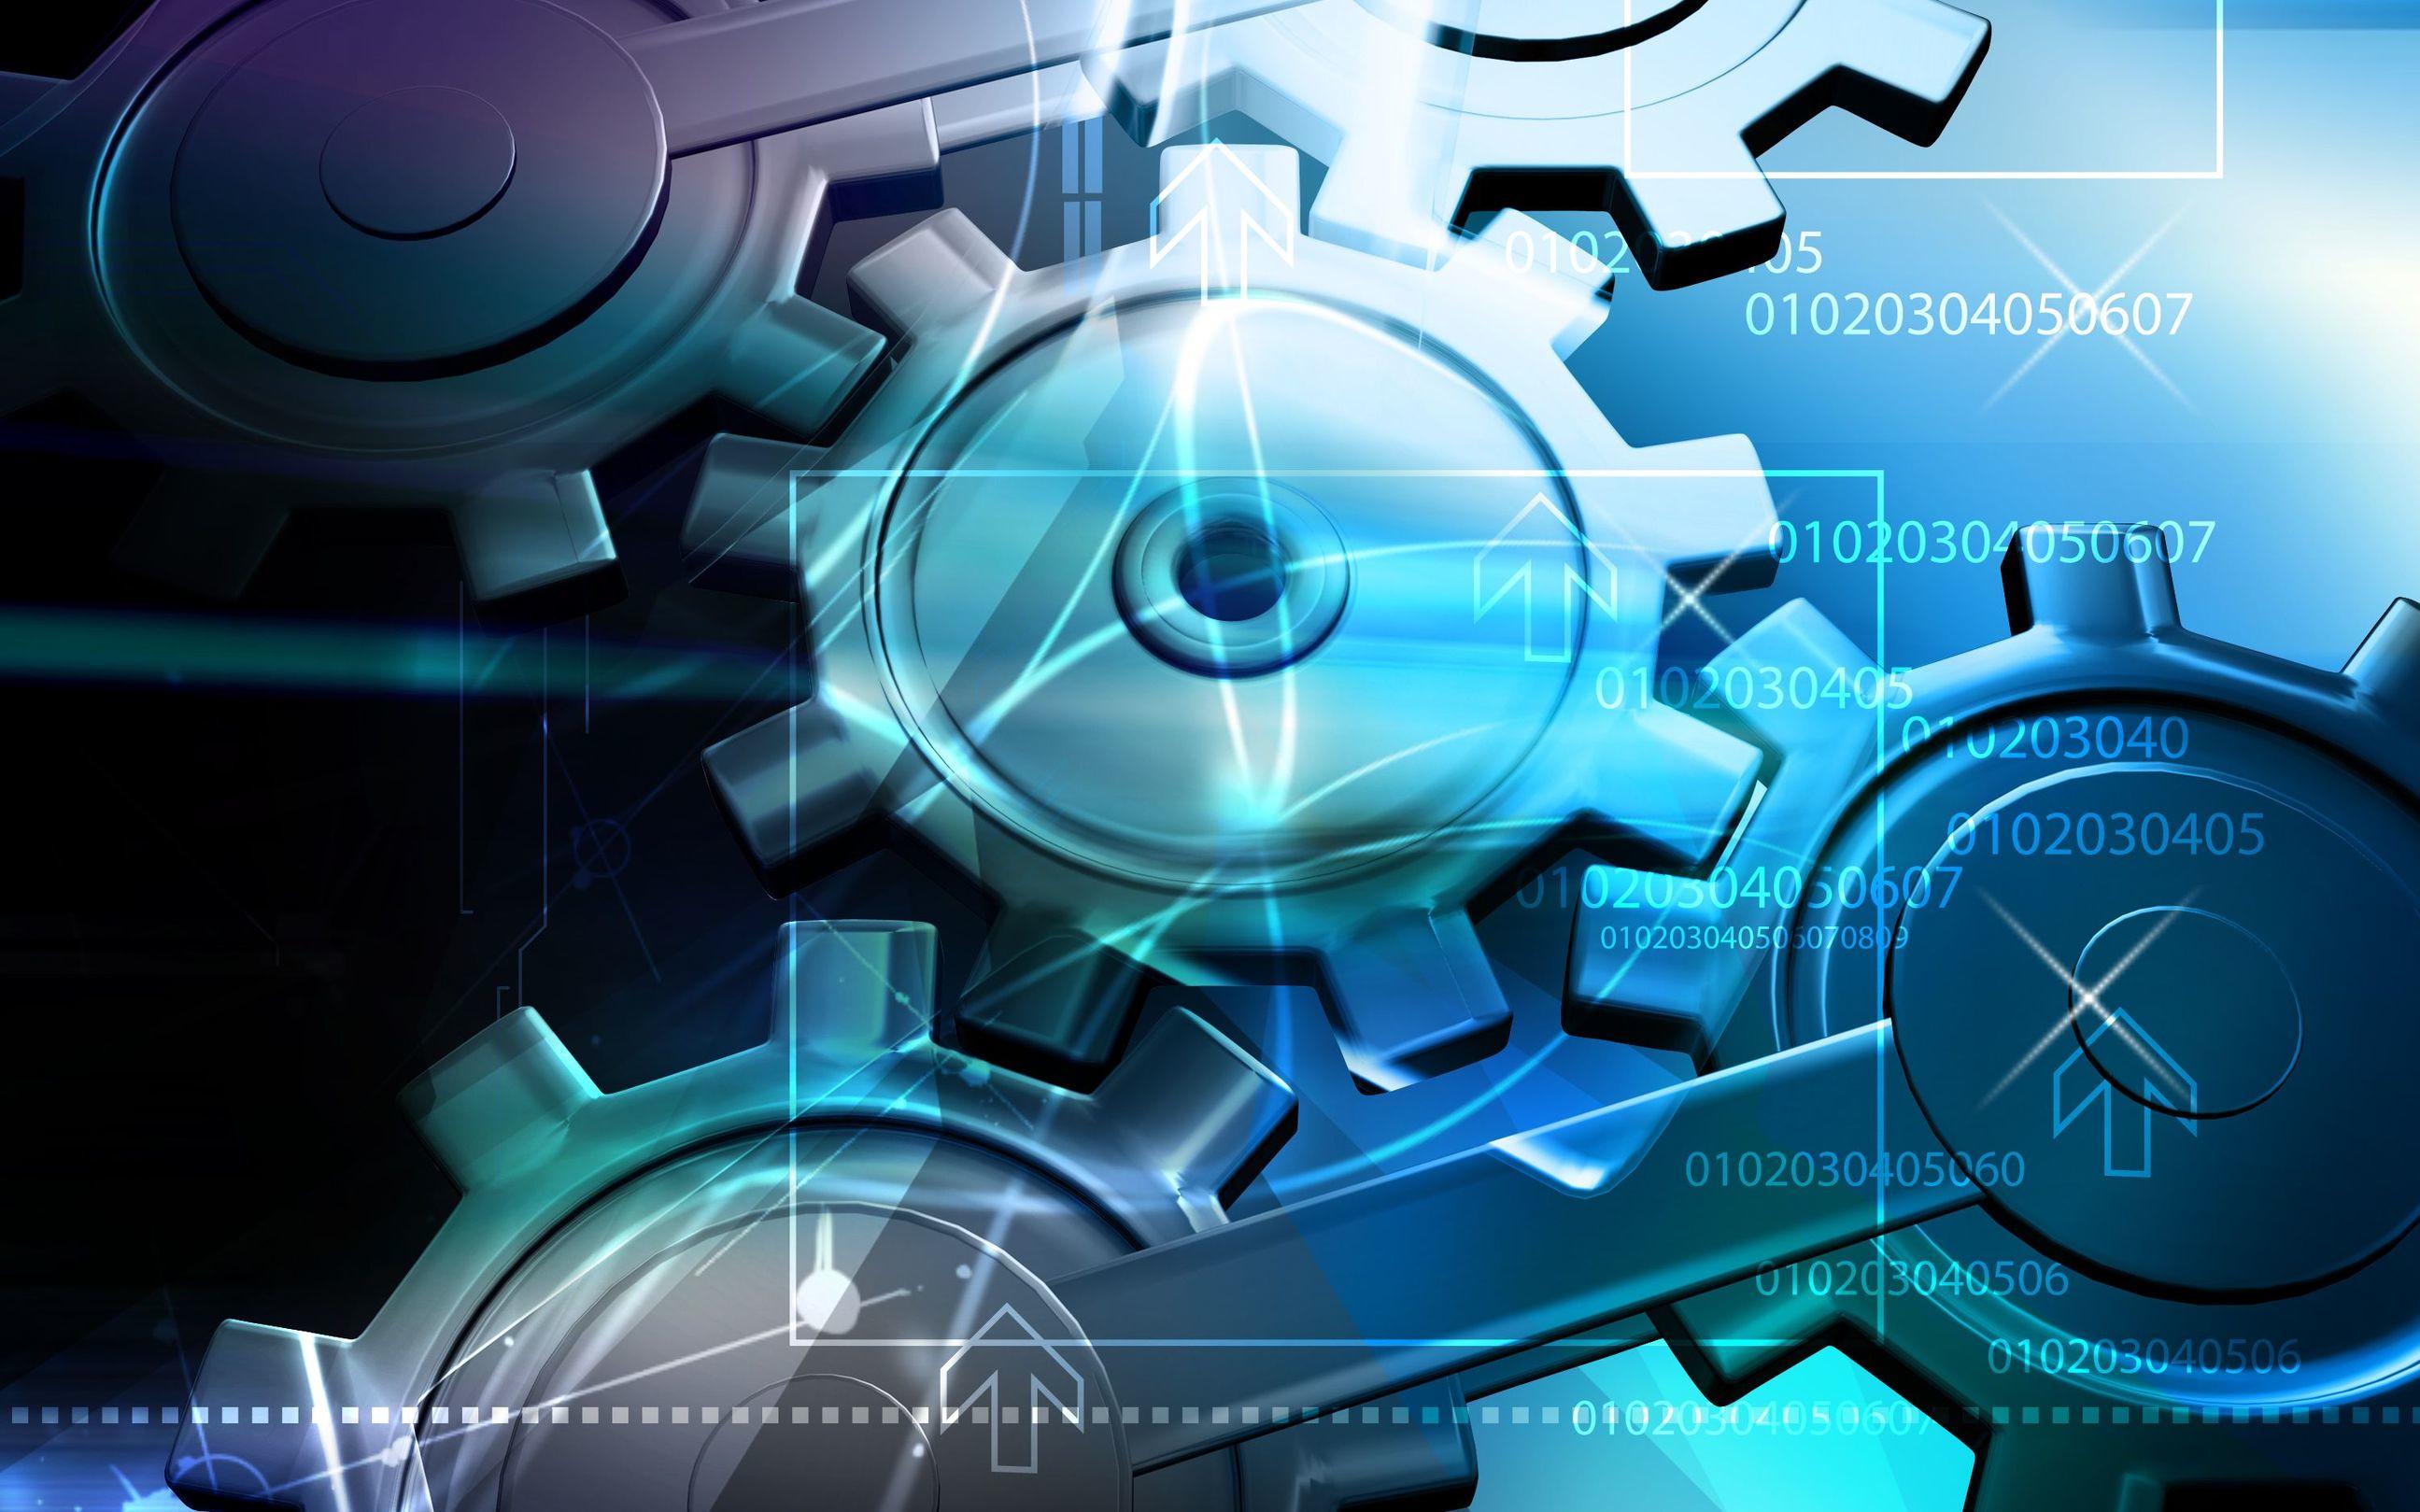 mechanical engineering wallpapers desktop – photo #34. BLUE GEARS